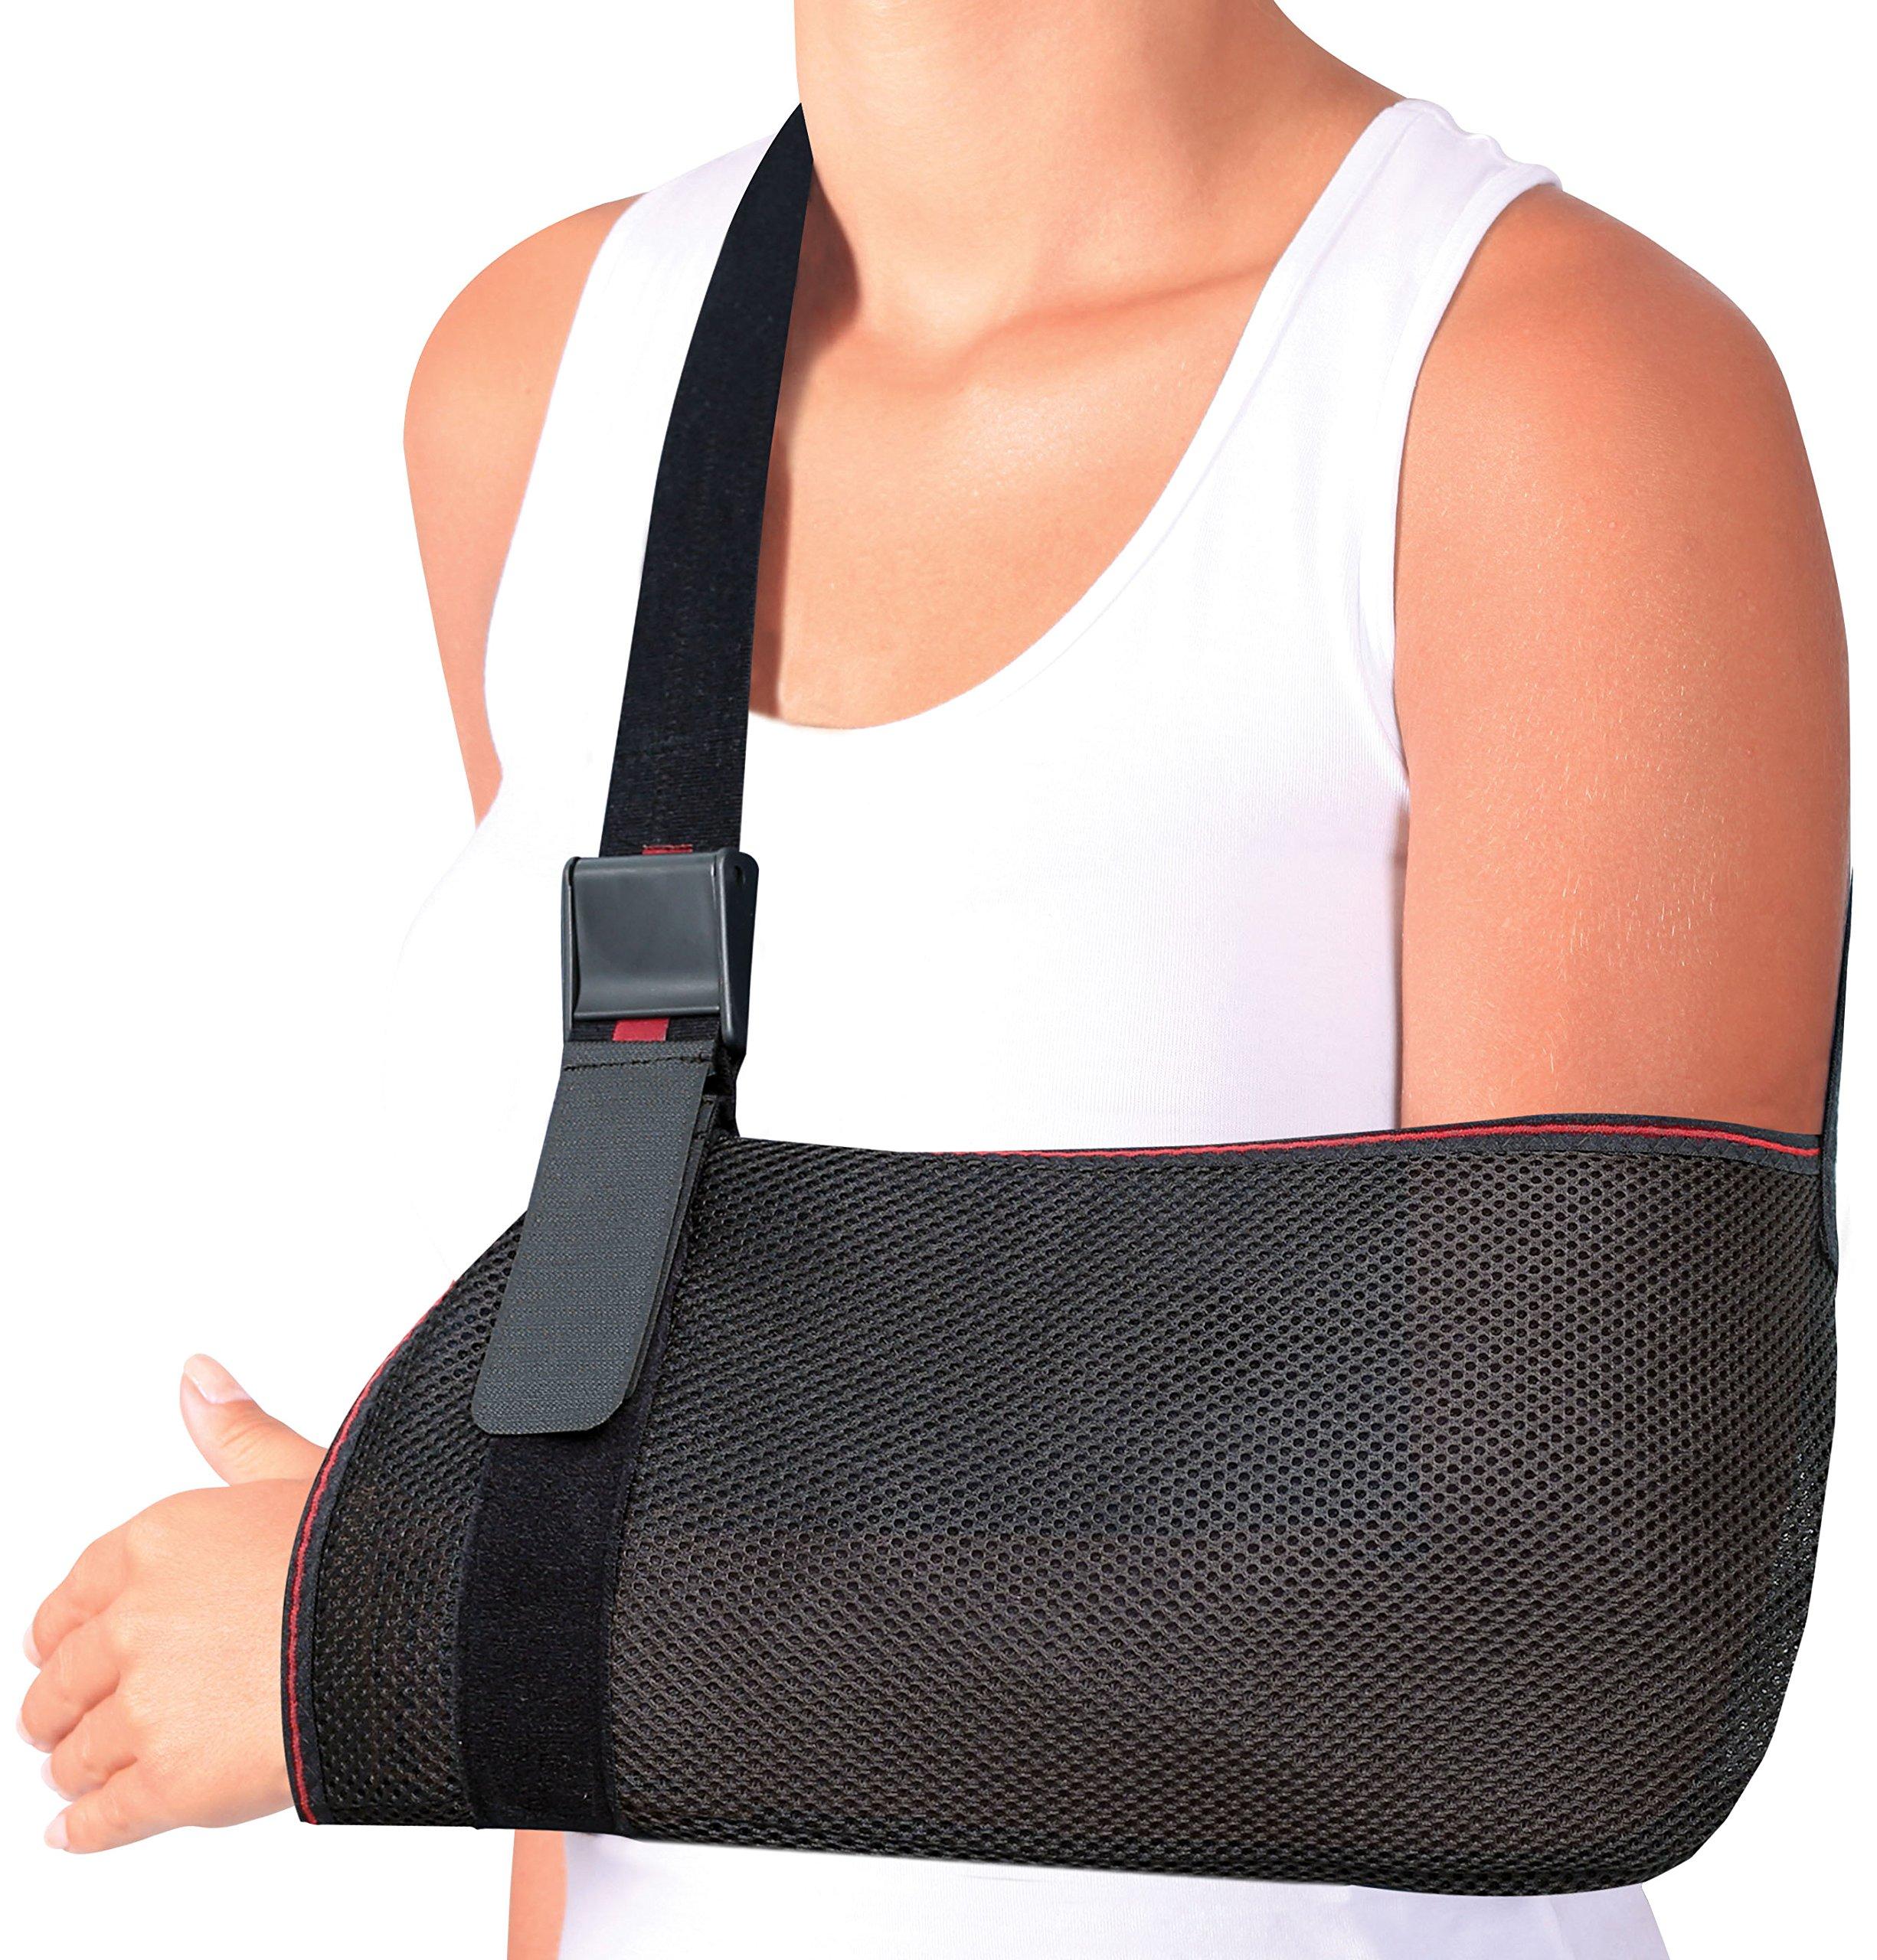 ORTONYX Mesh Arm Support Sling Shoulder Immobilizer Brace – Breathable and Lightweight – Fully Adjustable - S-M Black